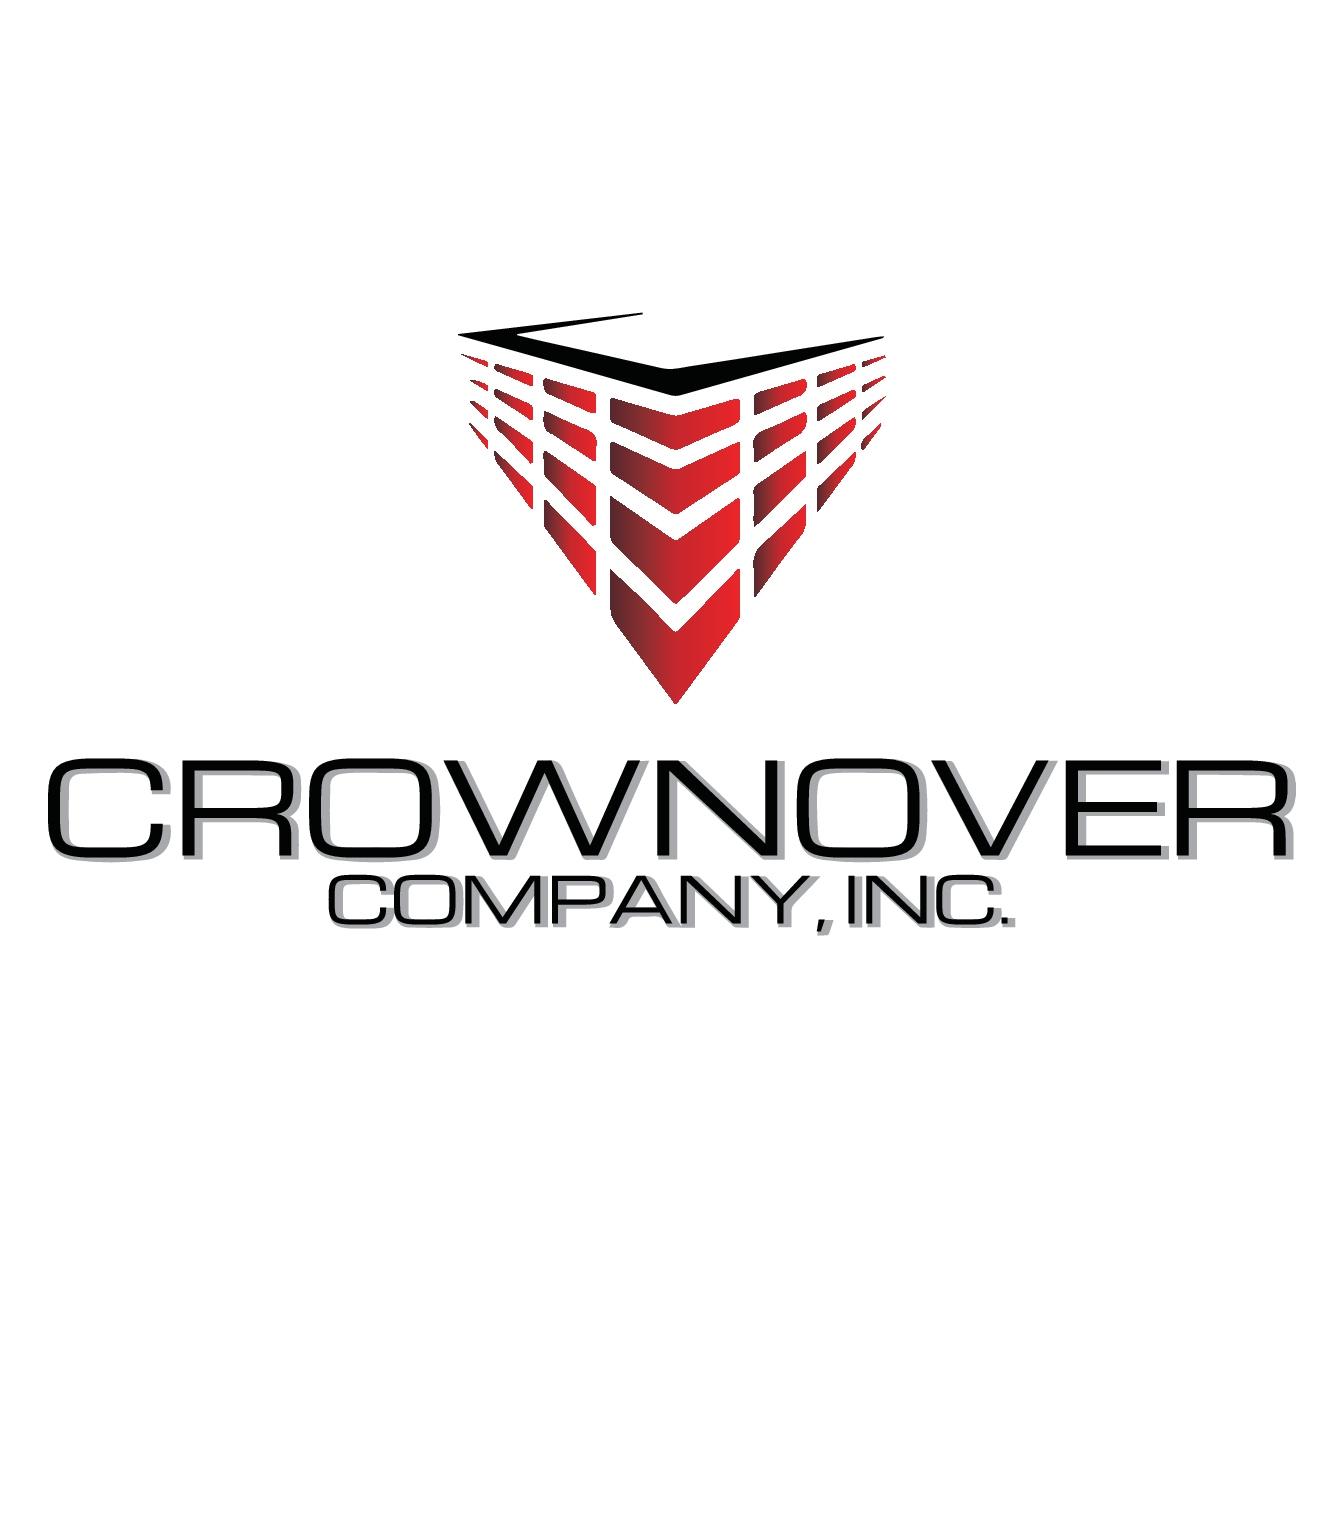 Crownover Company Inc